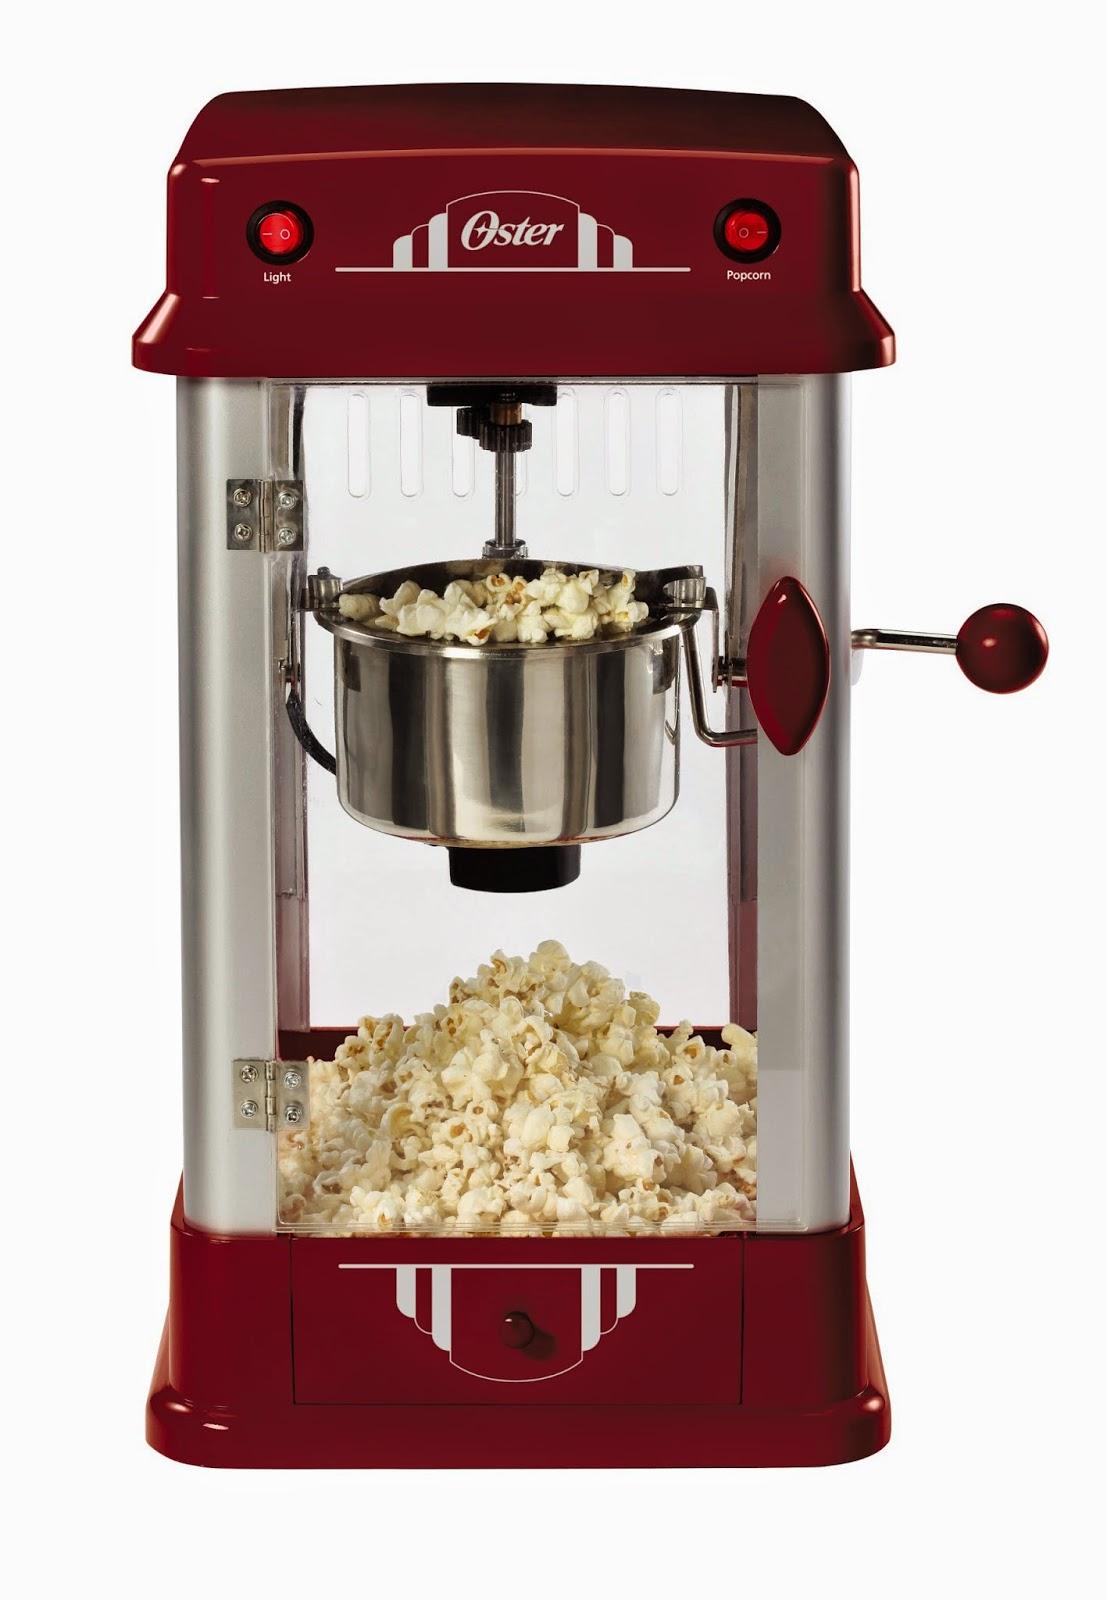 Cineman a popcorn maker de oster - Maquina para hacer deporte en casa ...